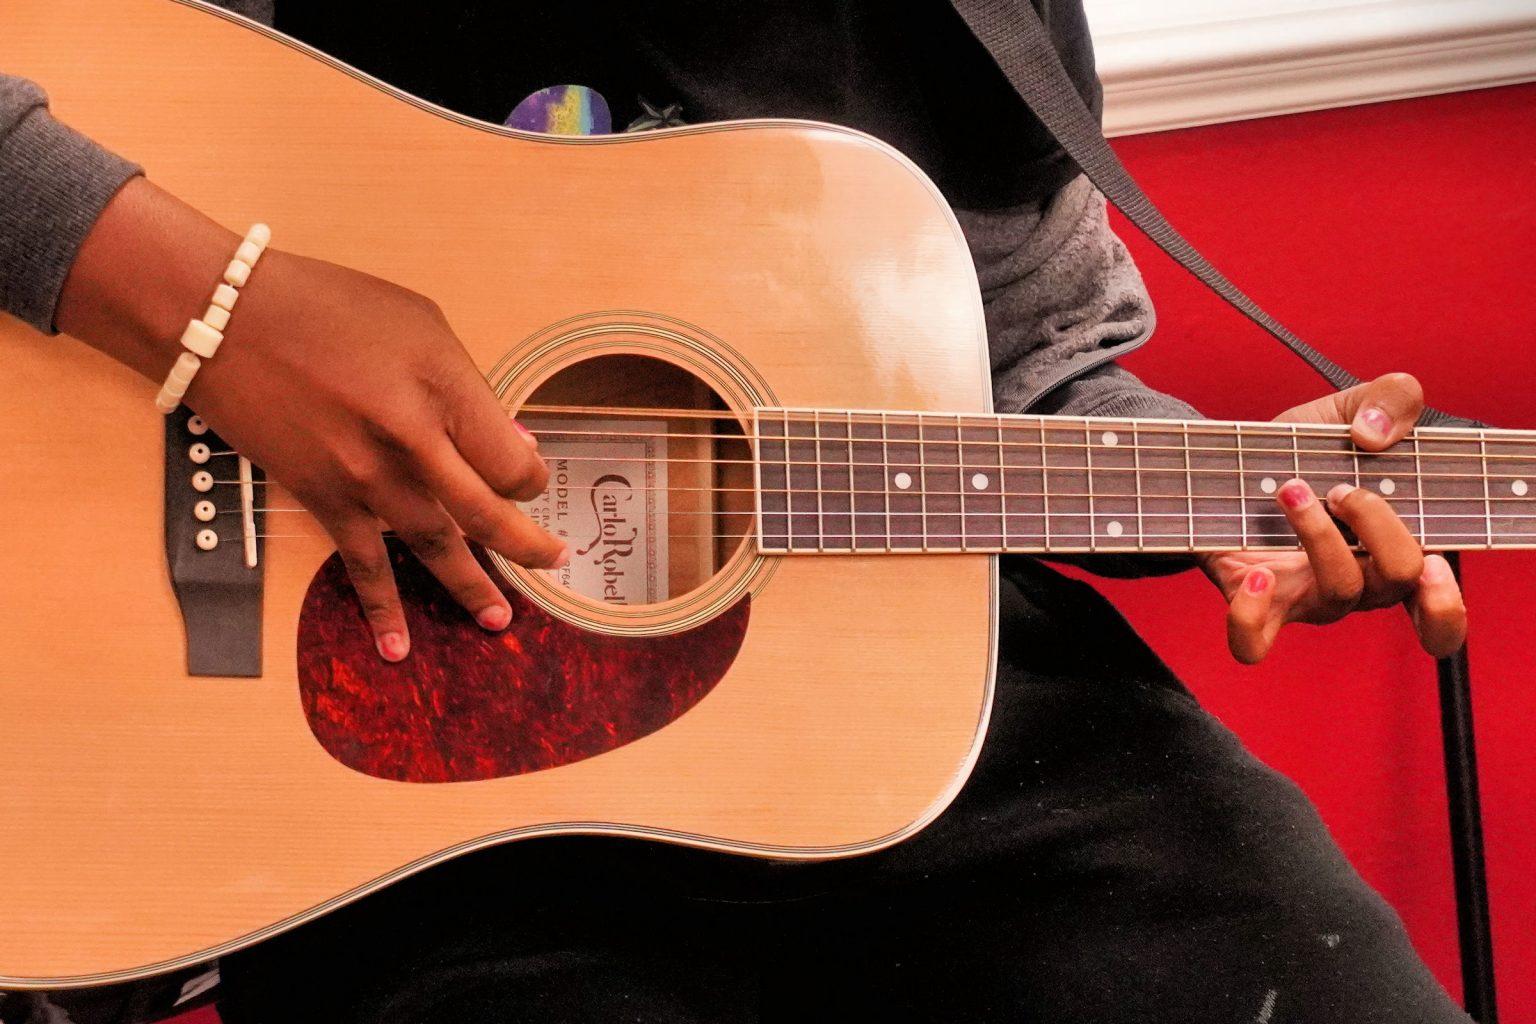 Hard chords are hard on the fingernails